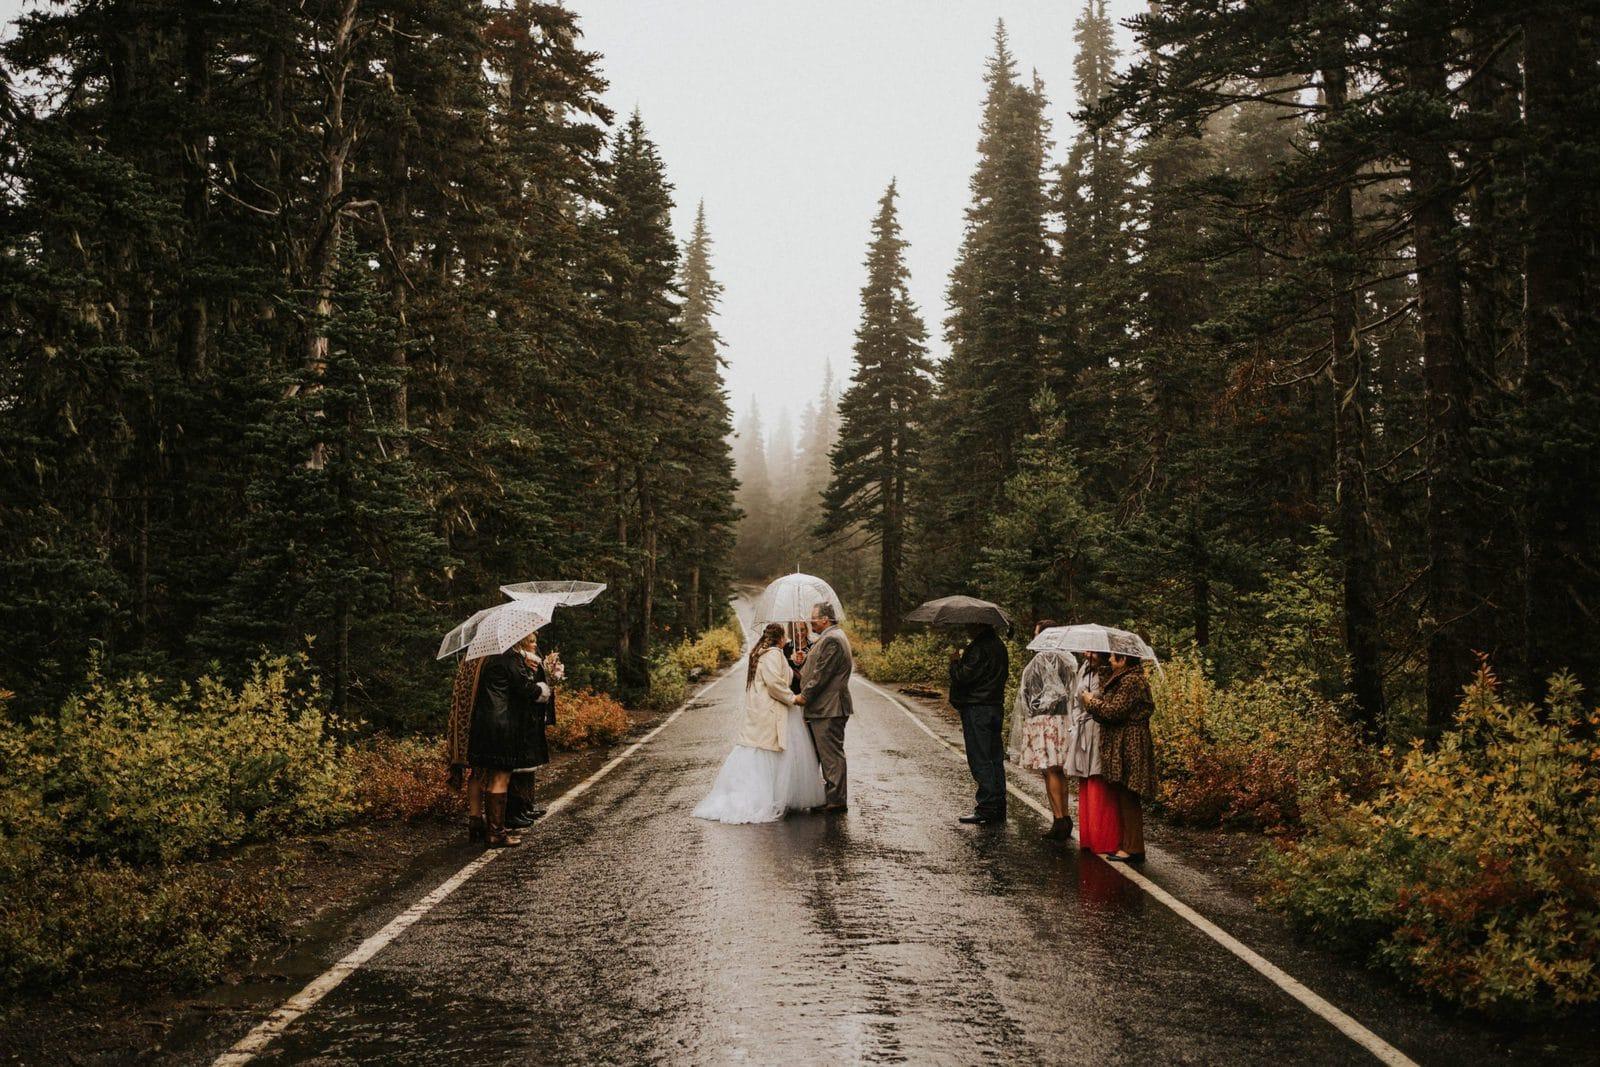 ceremony in the road at hurricane ridge elopement